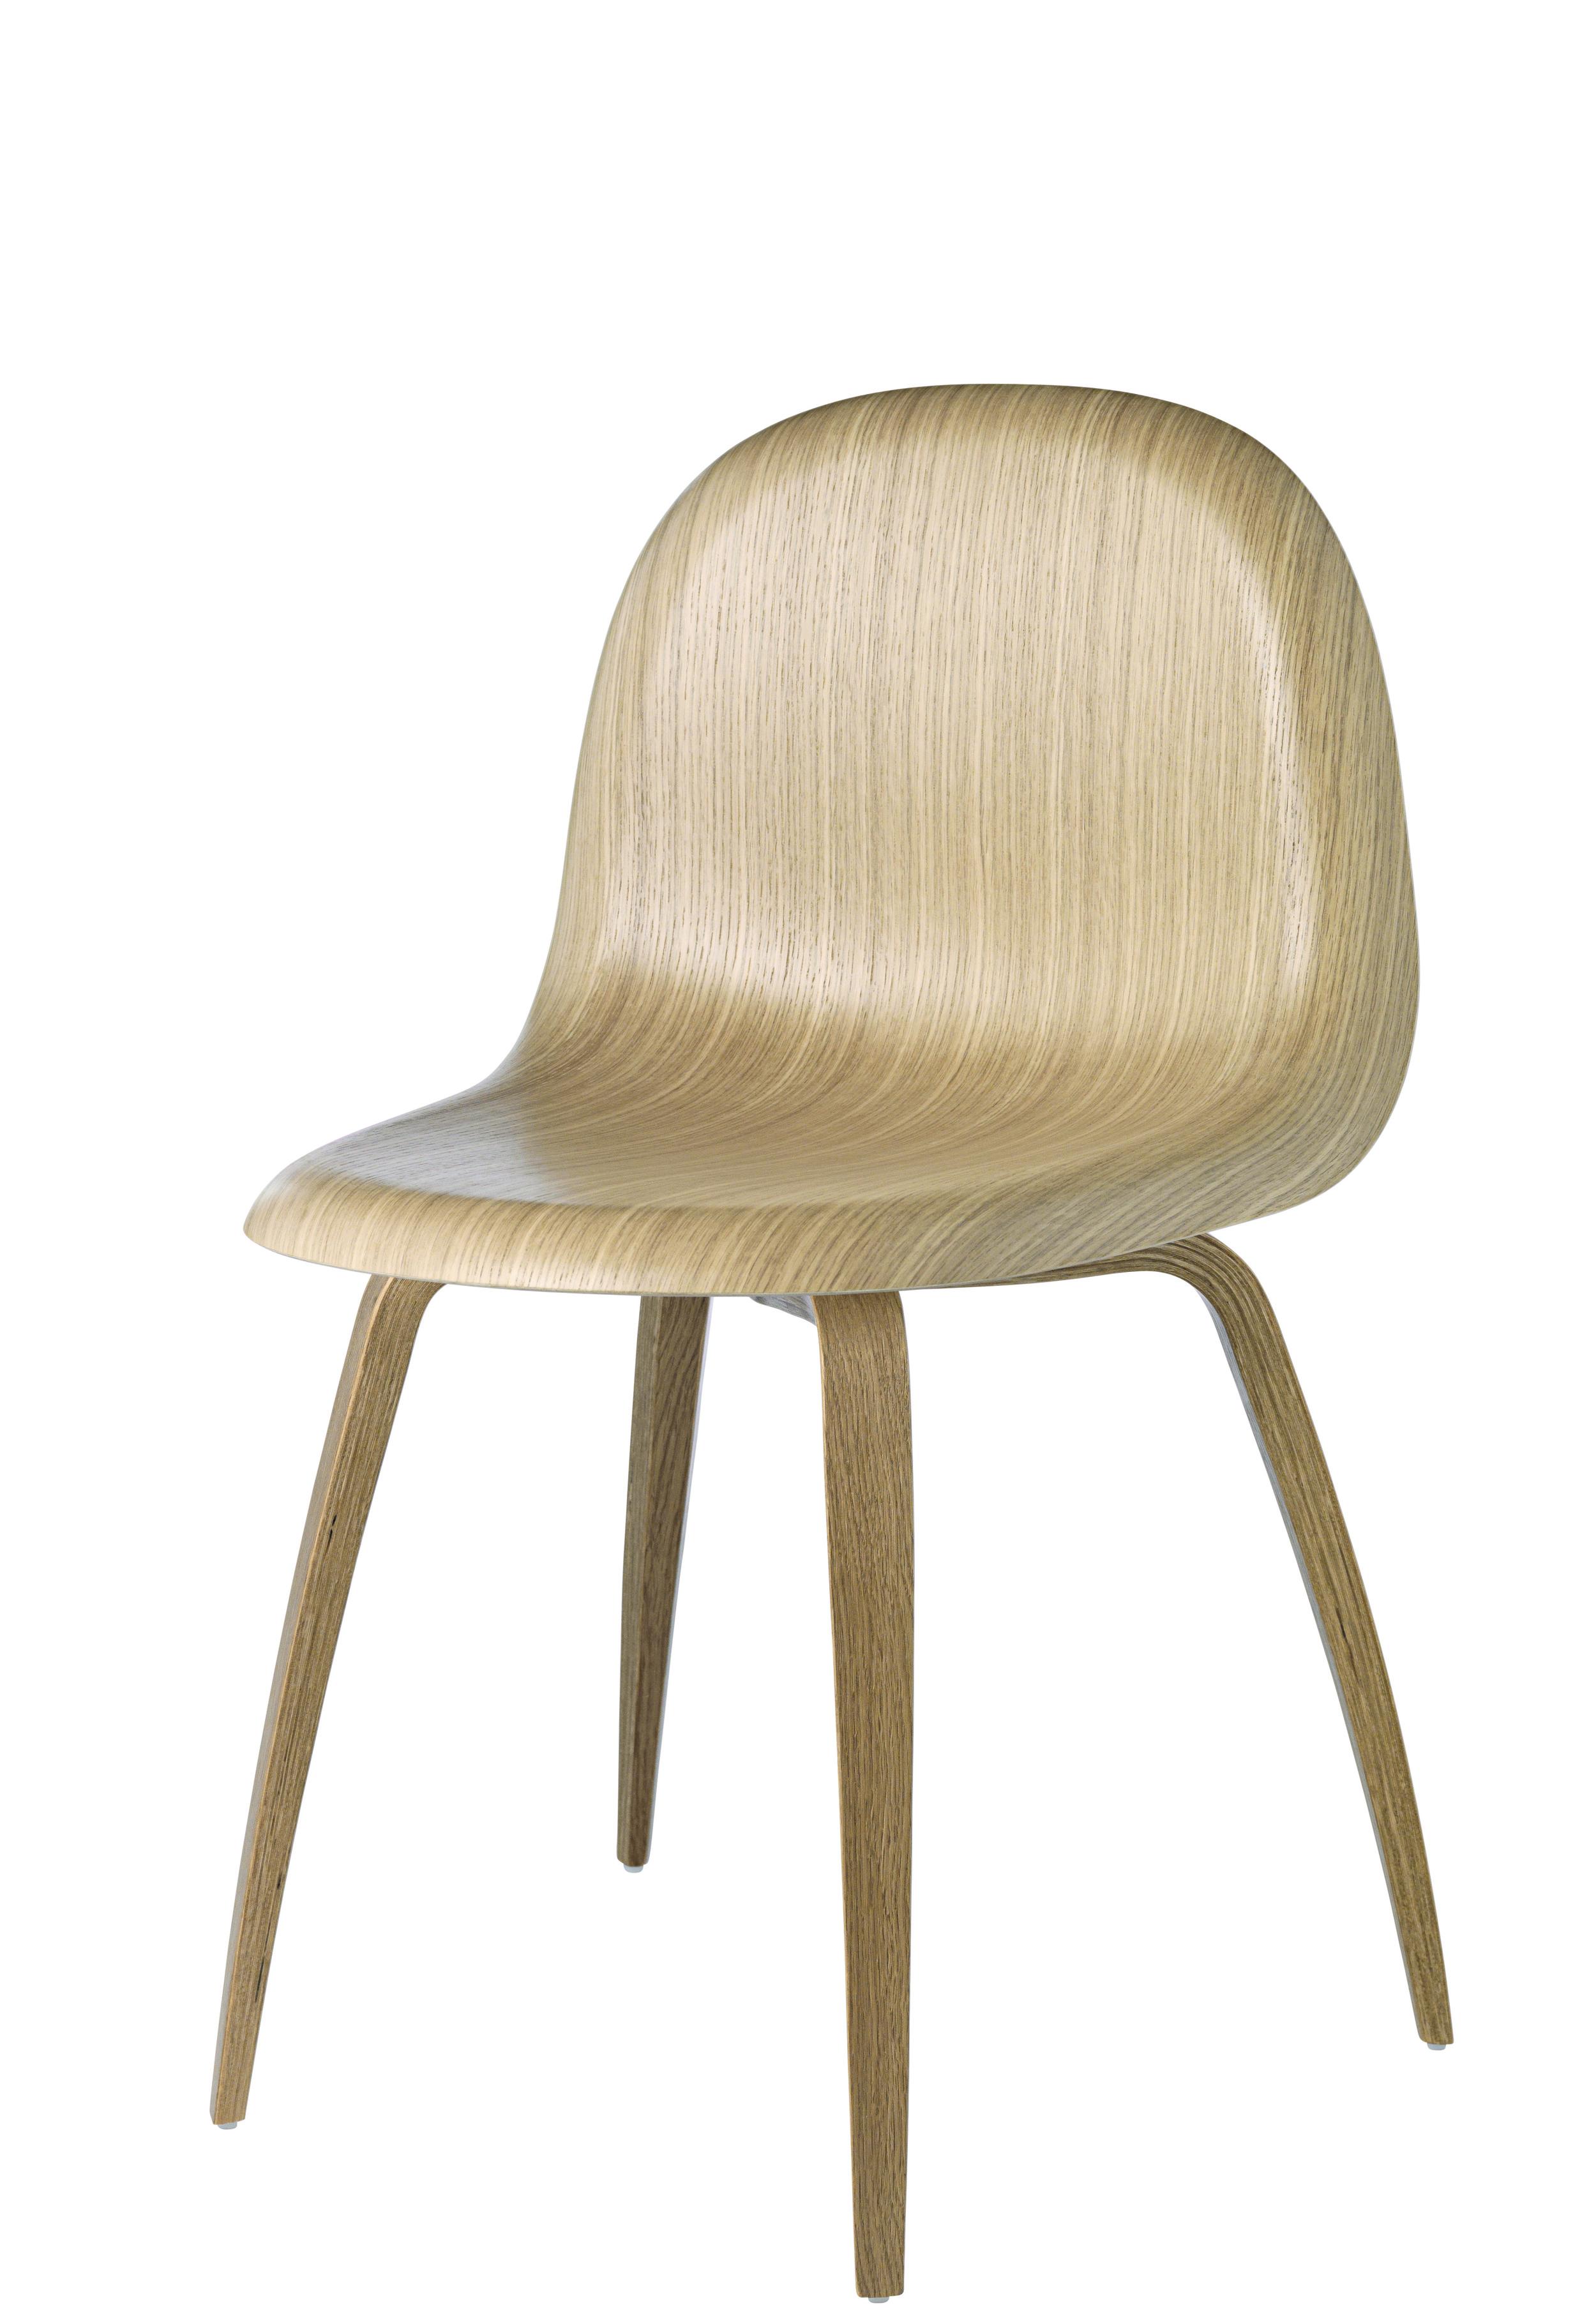 Gubi 5 Chair_Oak Shell_Oak Base_Front.jpg